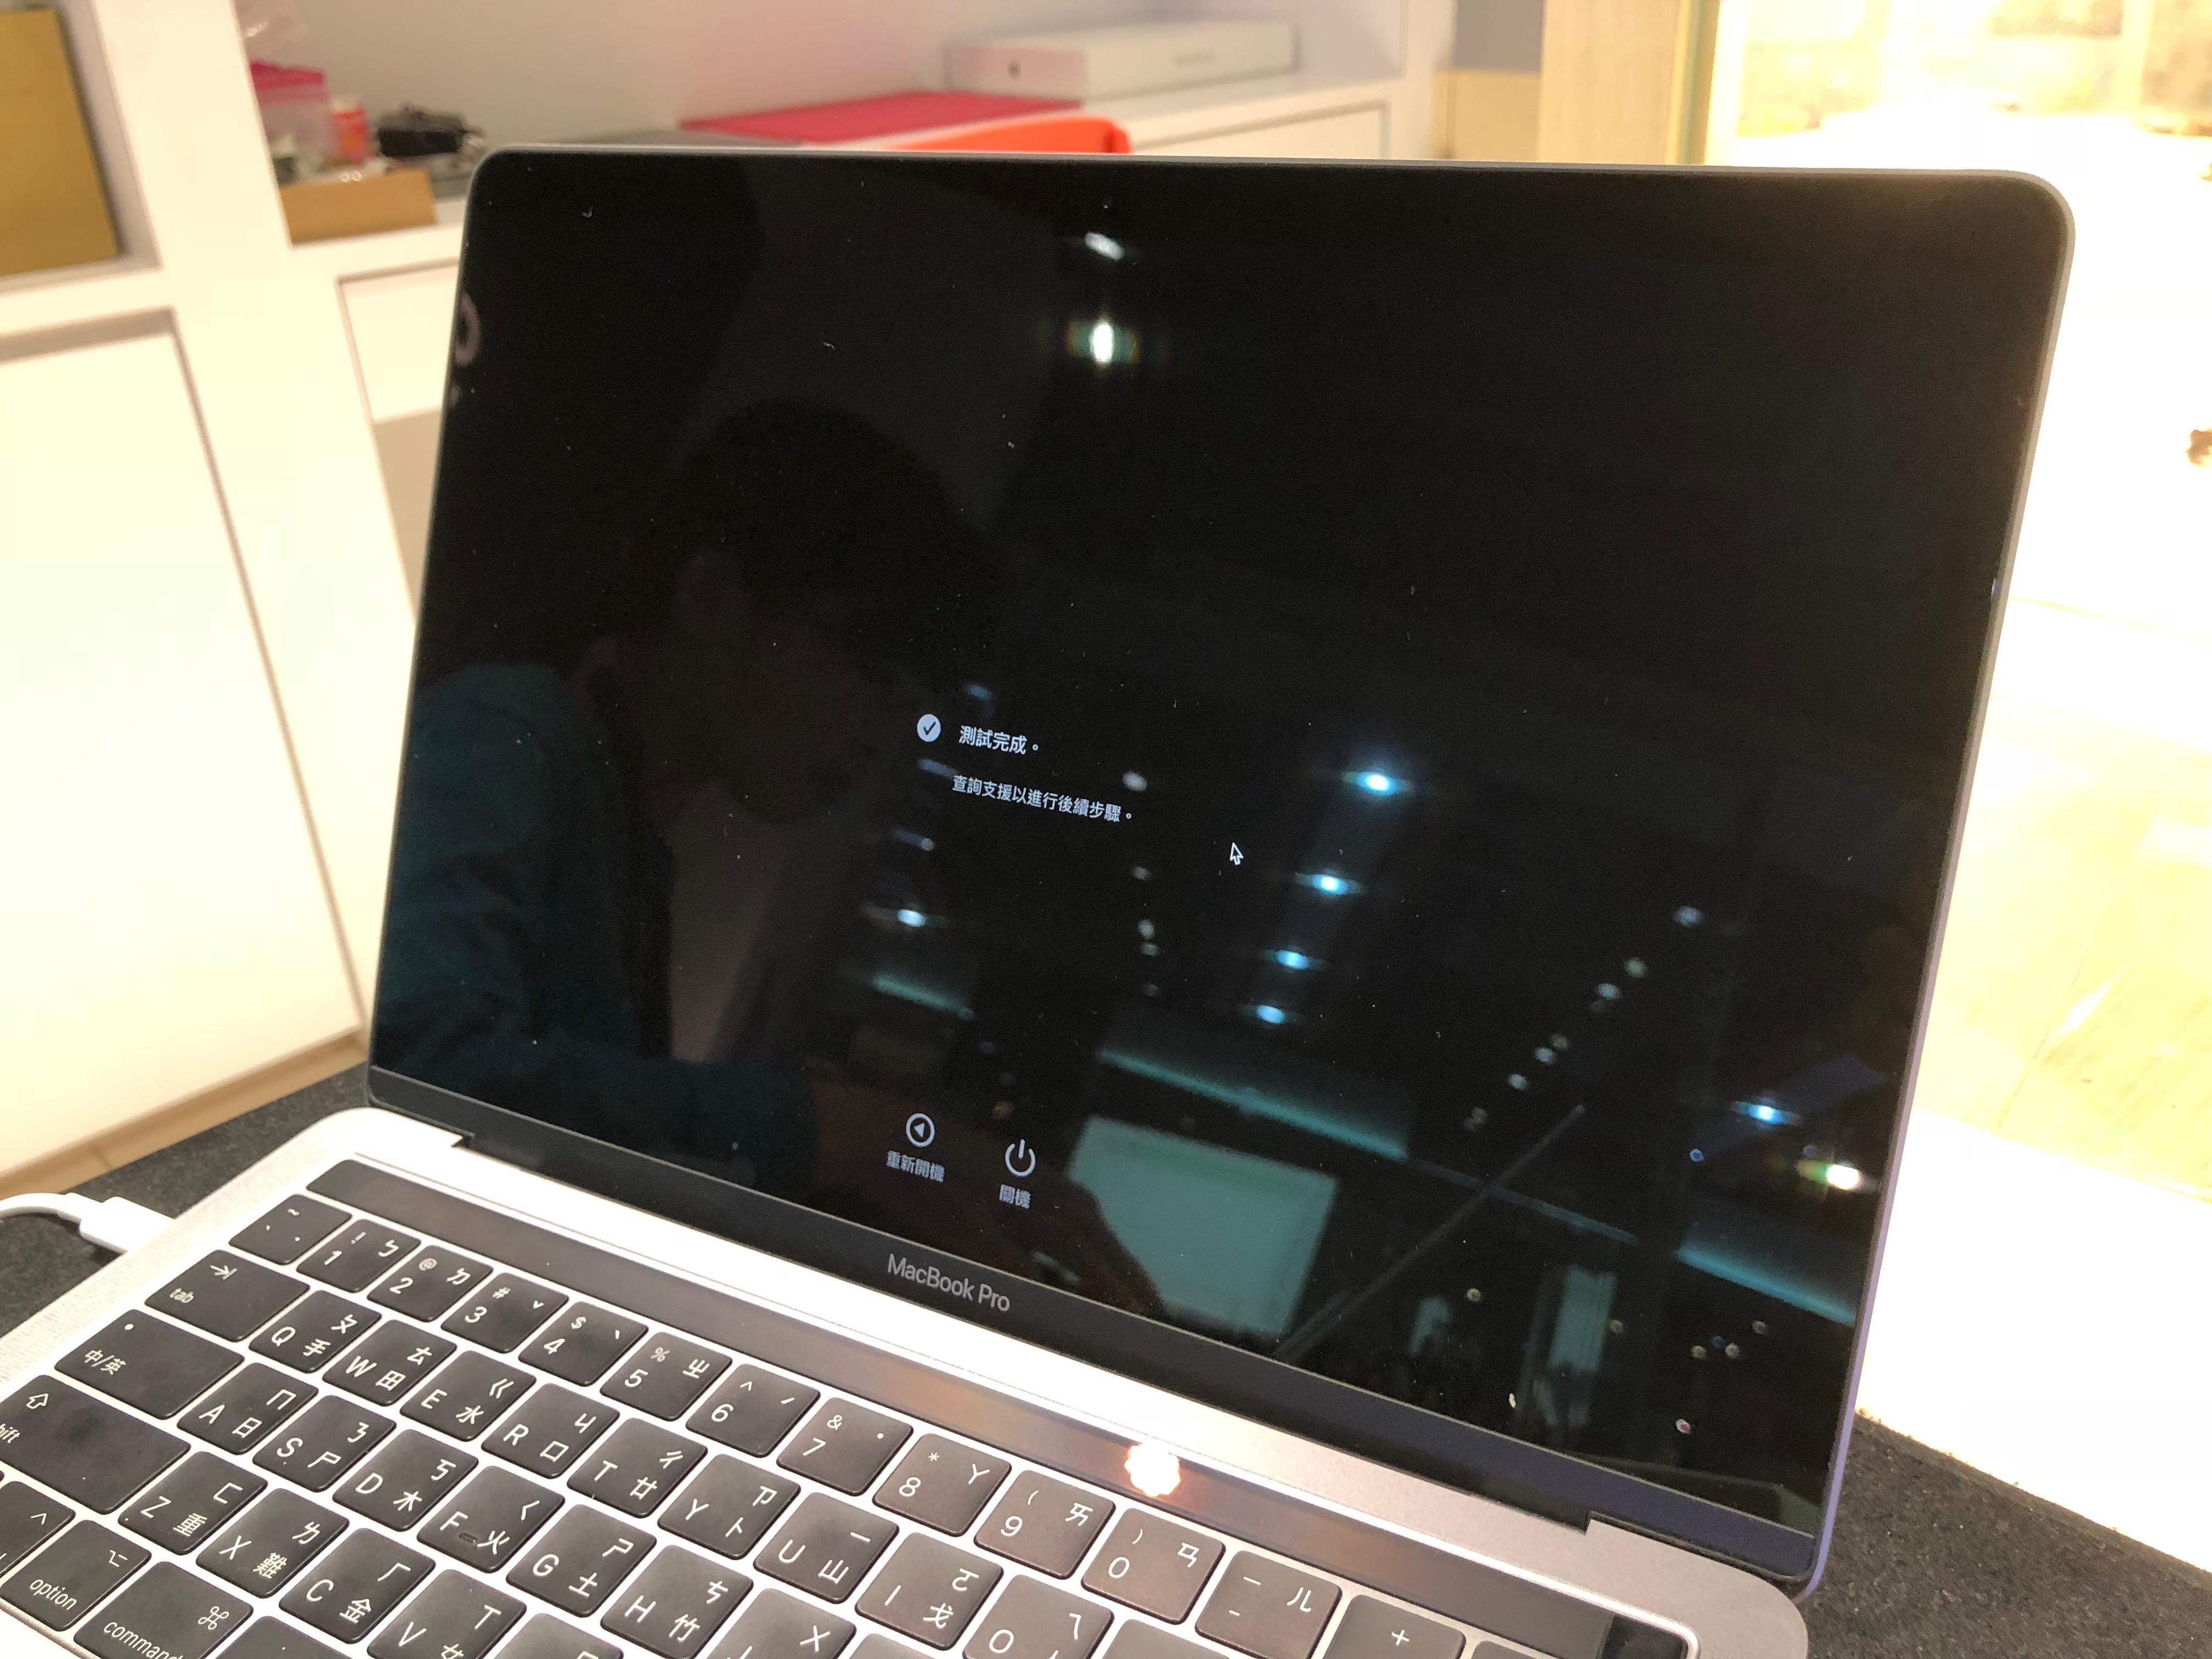 MacBook Pro 鍵盤故障送修過程-硬體檢測 2